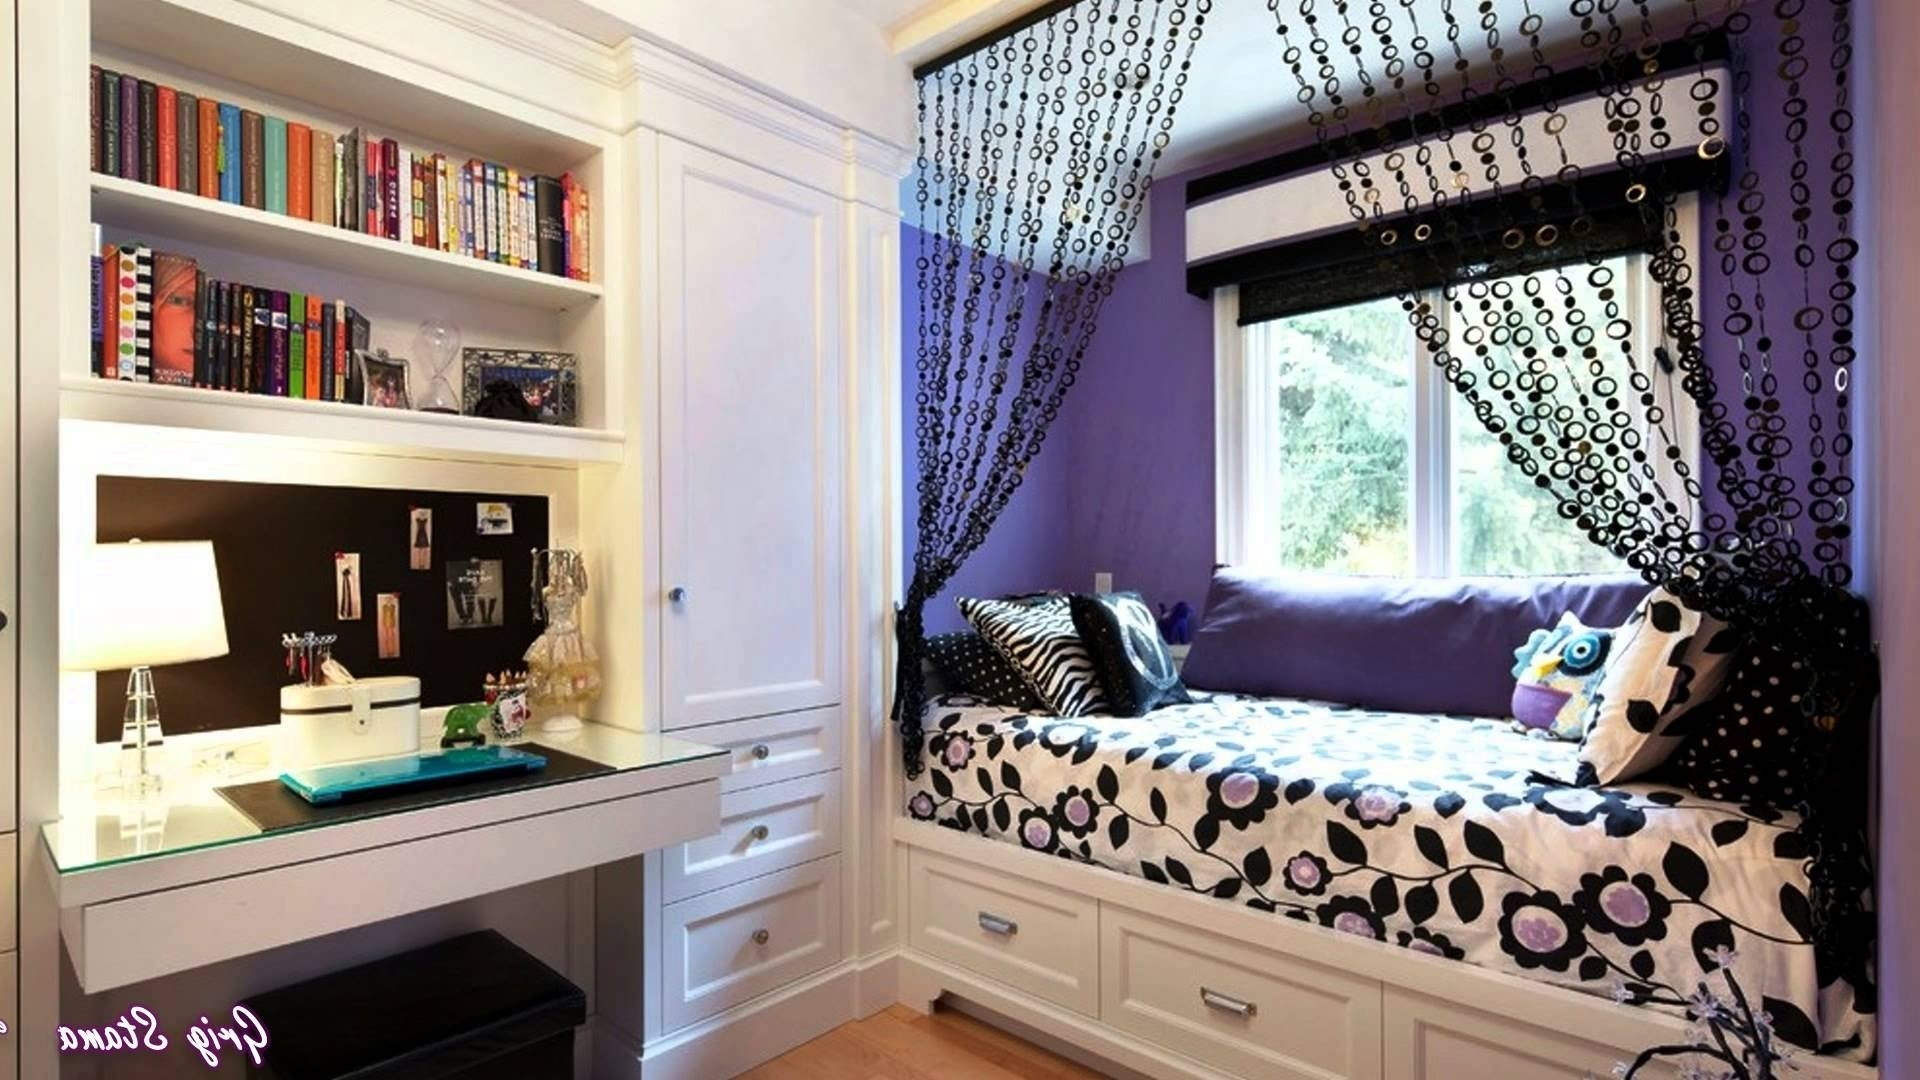 10 Stylish Teenage Girl Bedroom Decorating Ideas bedroom decorating ideas diy elegant design wonderful of marvelous 2020